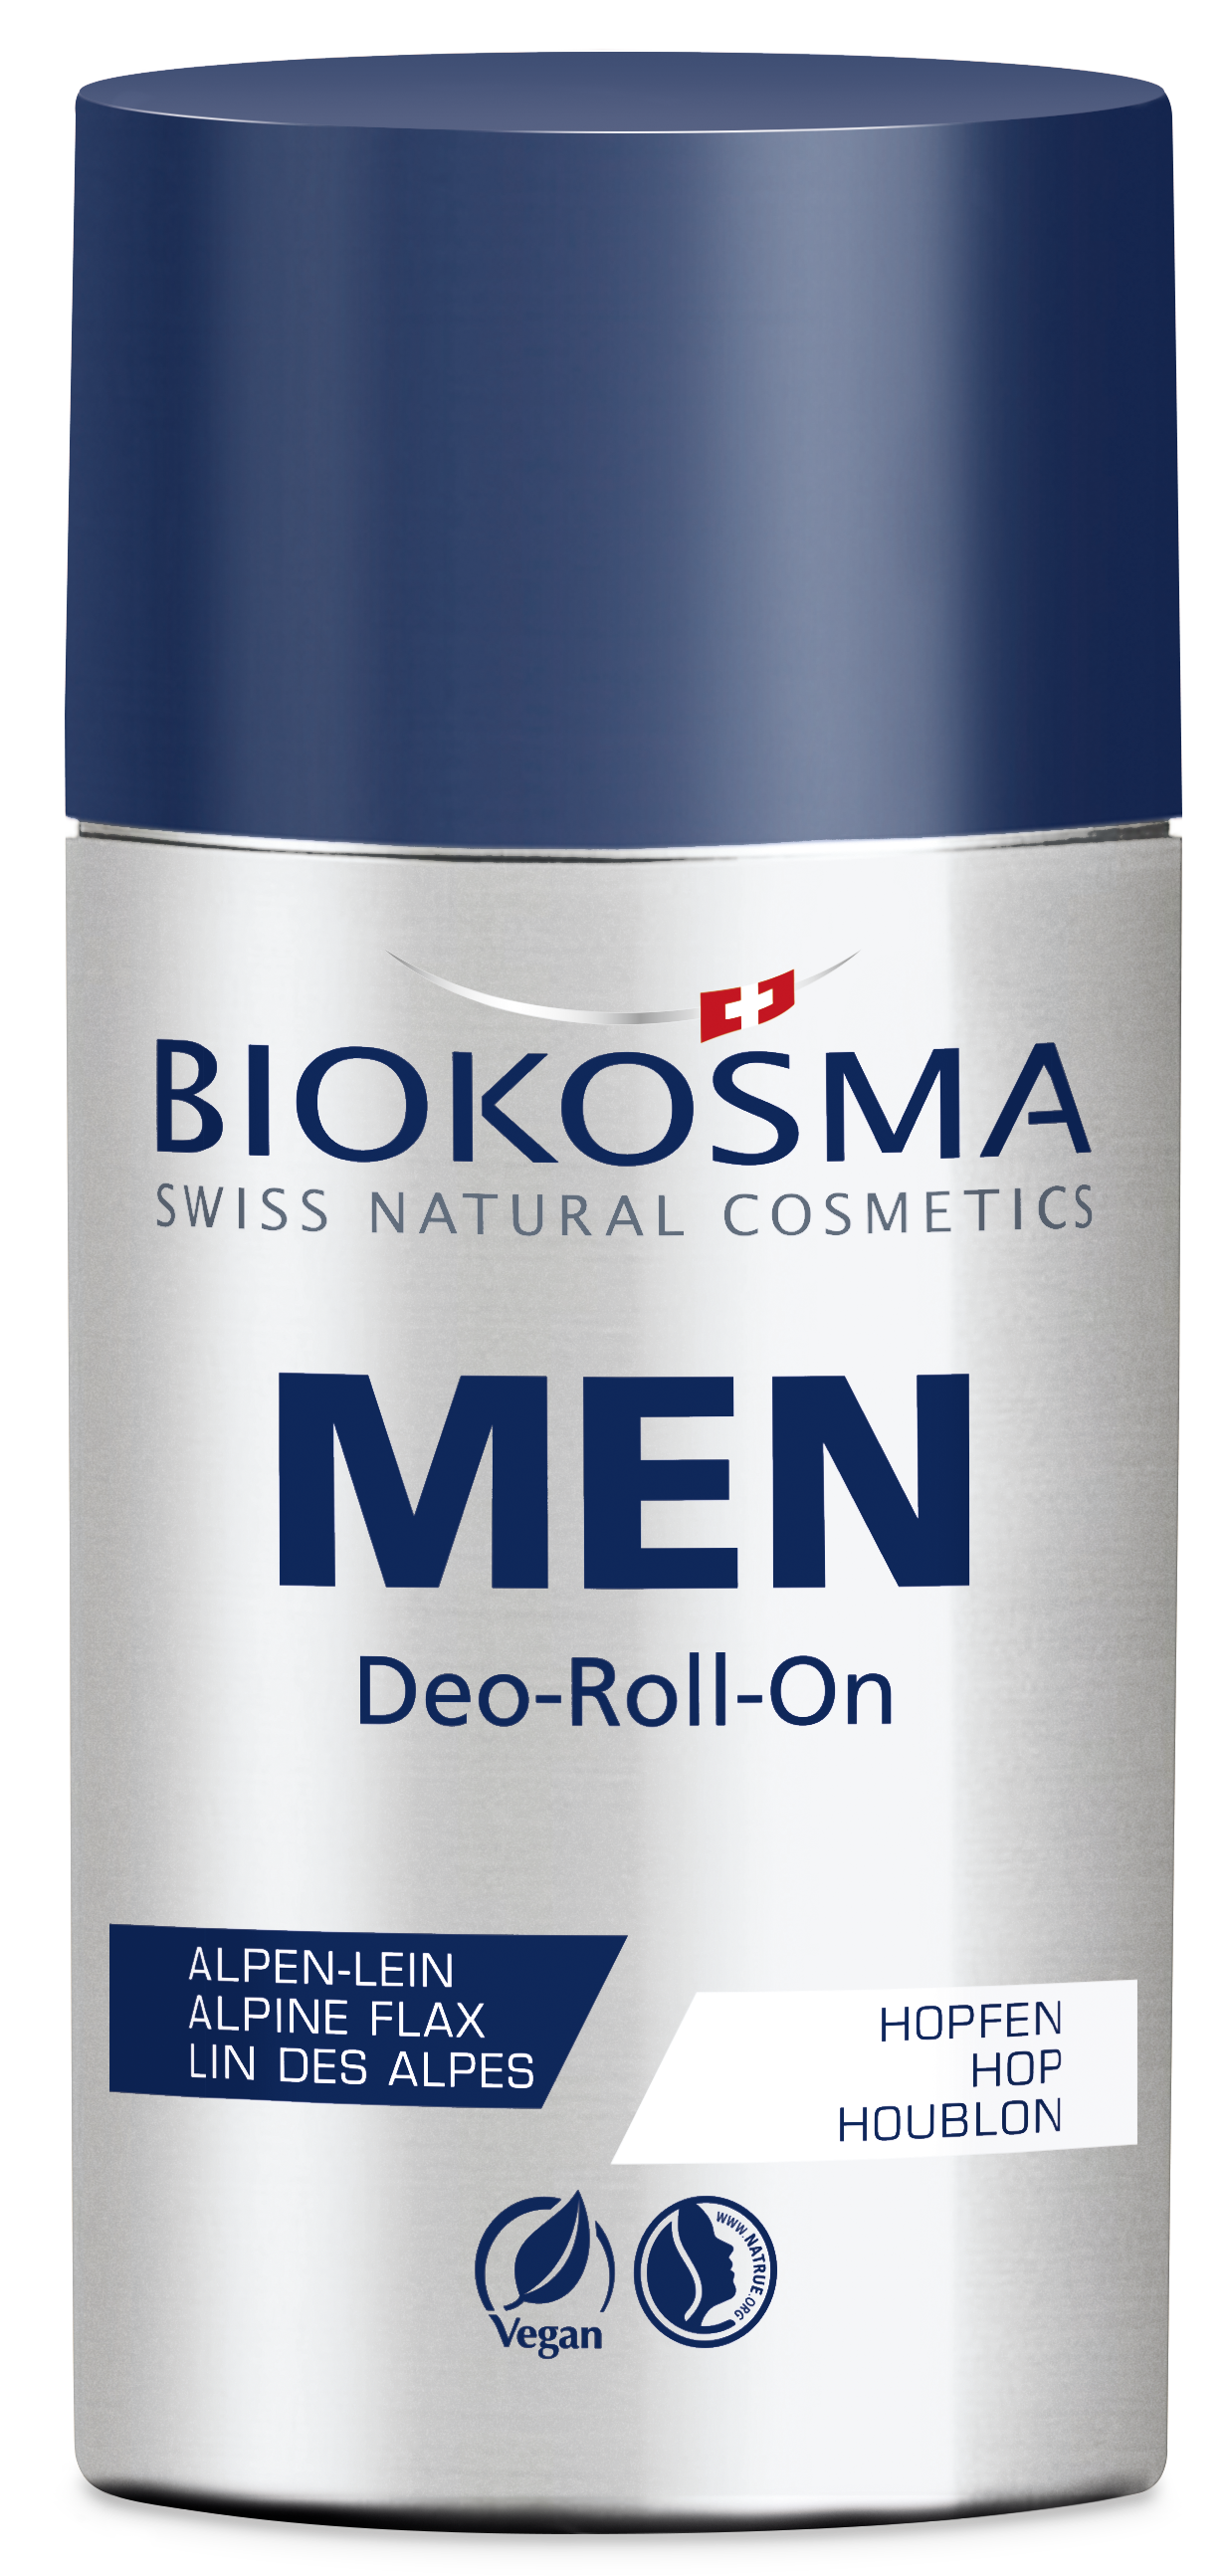 biokosma men 39 s care deo roll on ohne aluminium salze. Black Bedroom Furniture Sets. Home Design Ideas